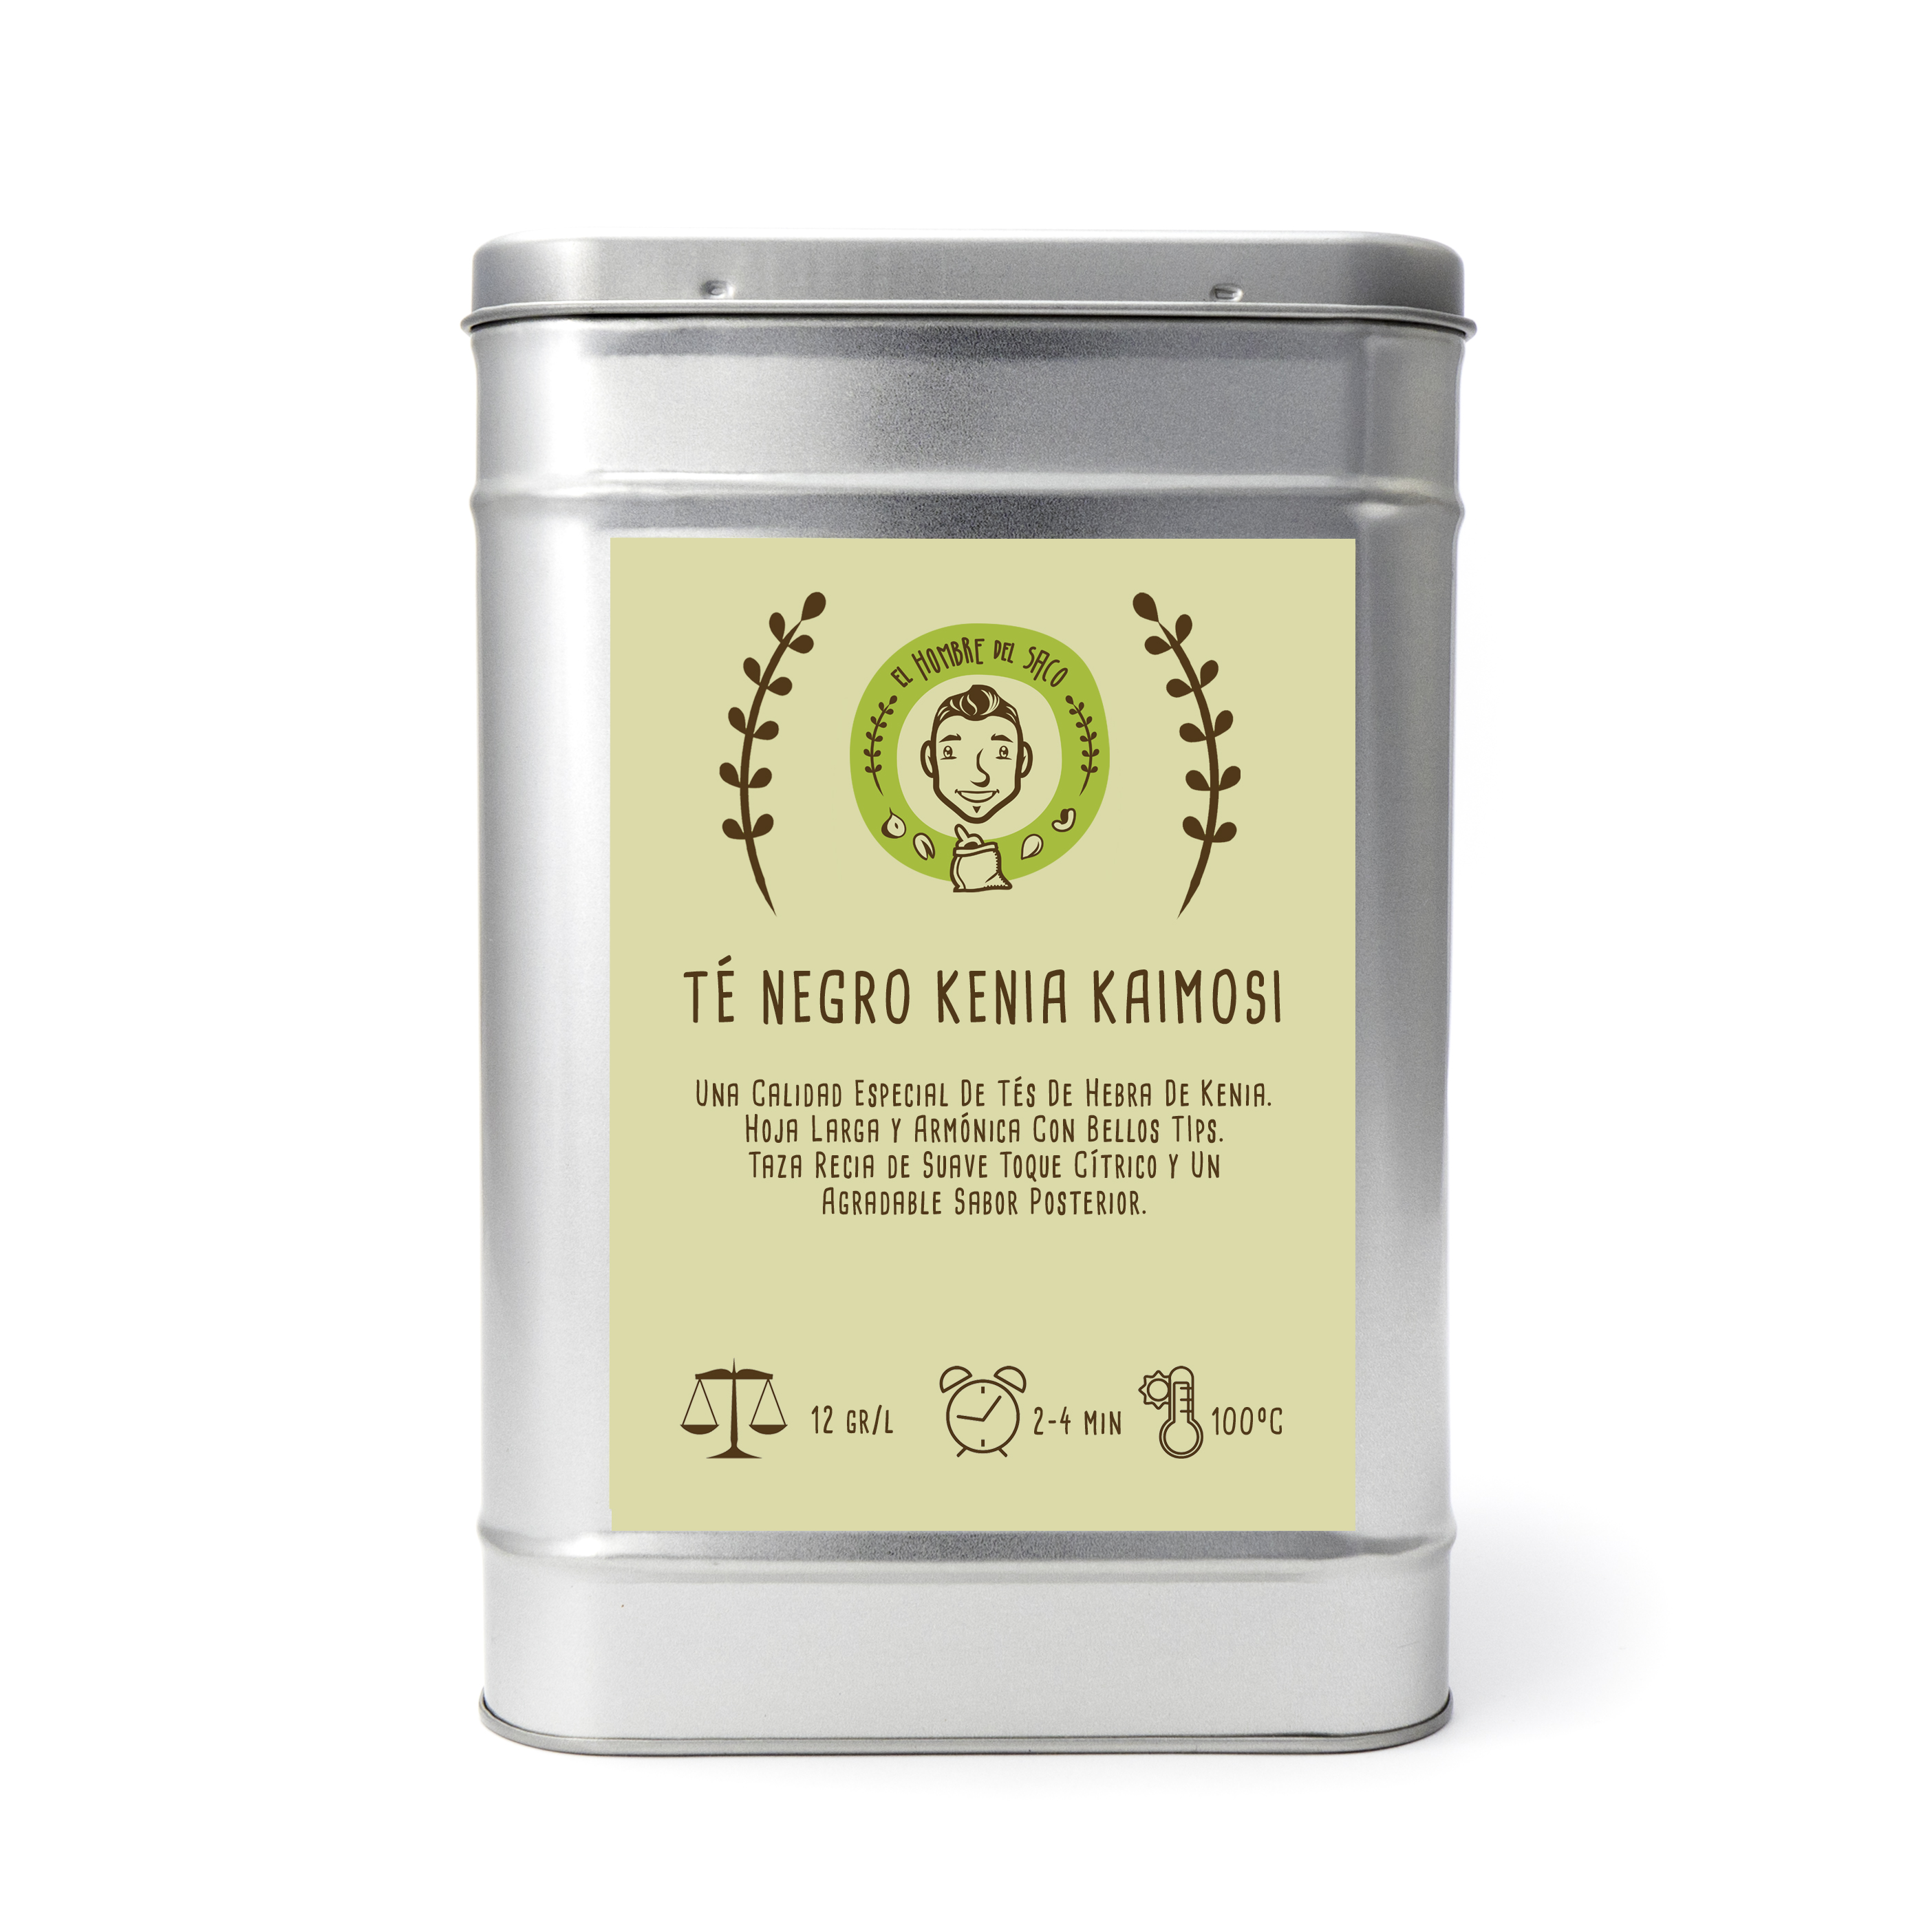 Té negro Kenia Kaimosi